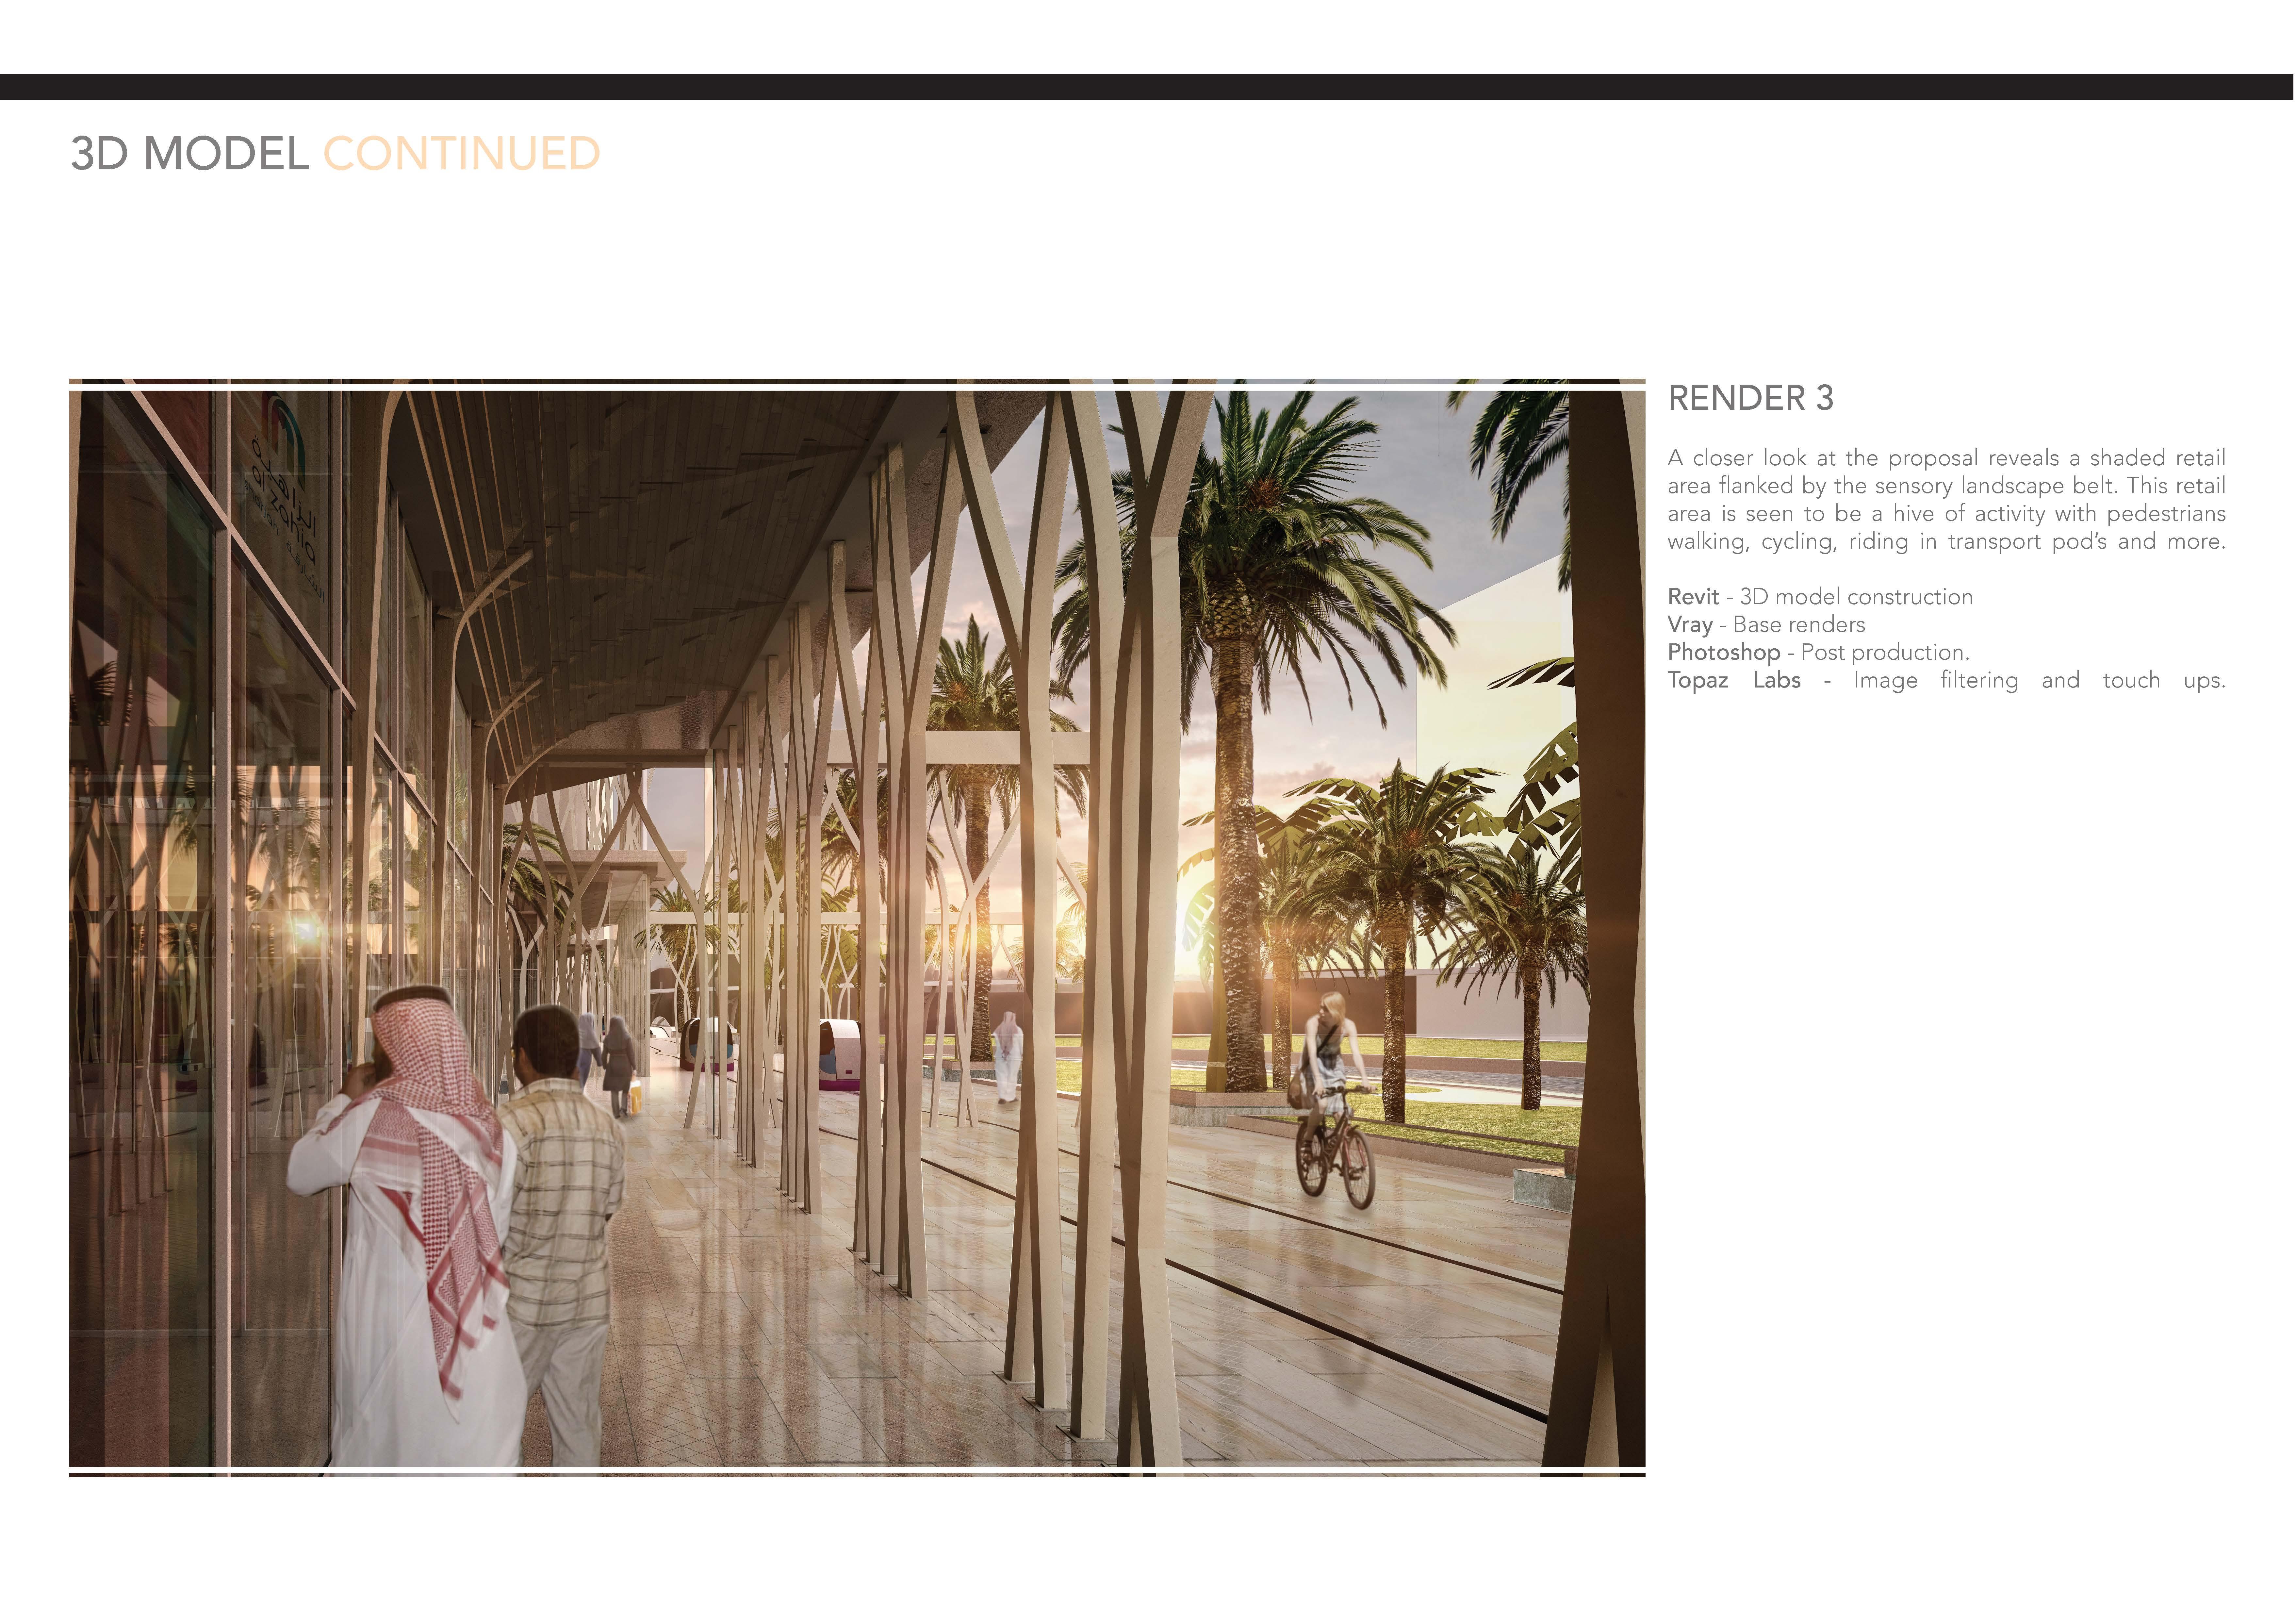 Dubai Oasis - Covered Retail